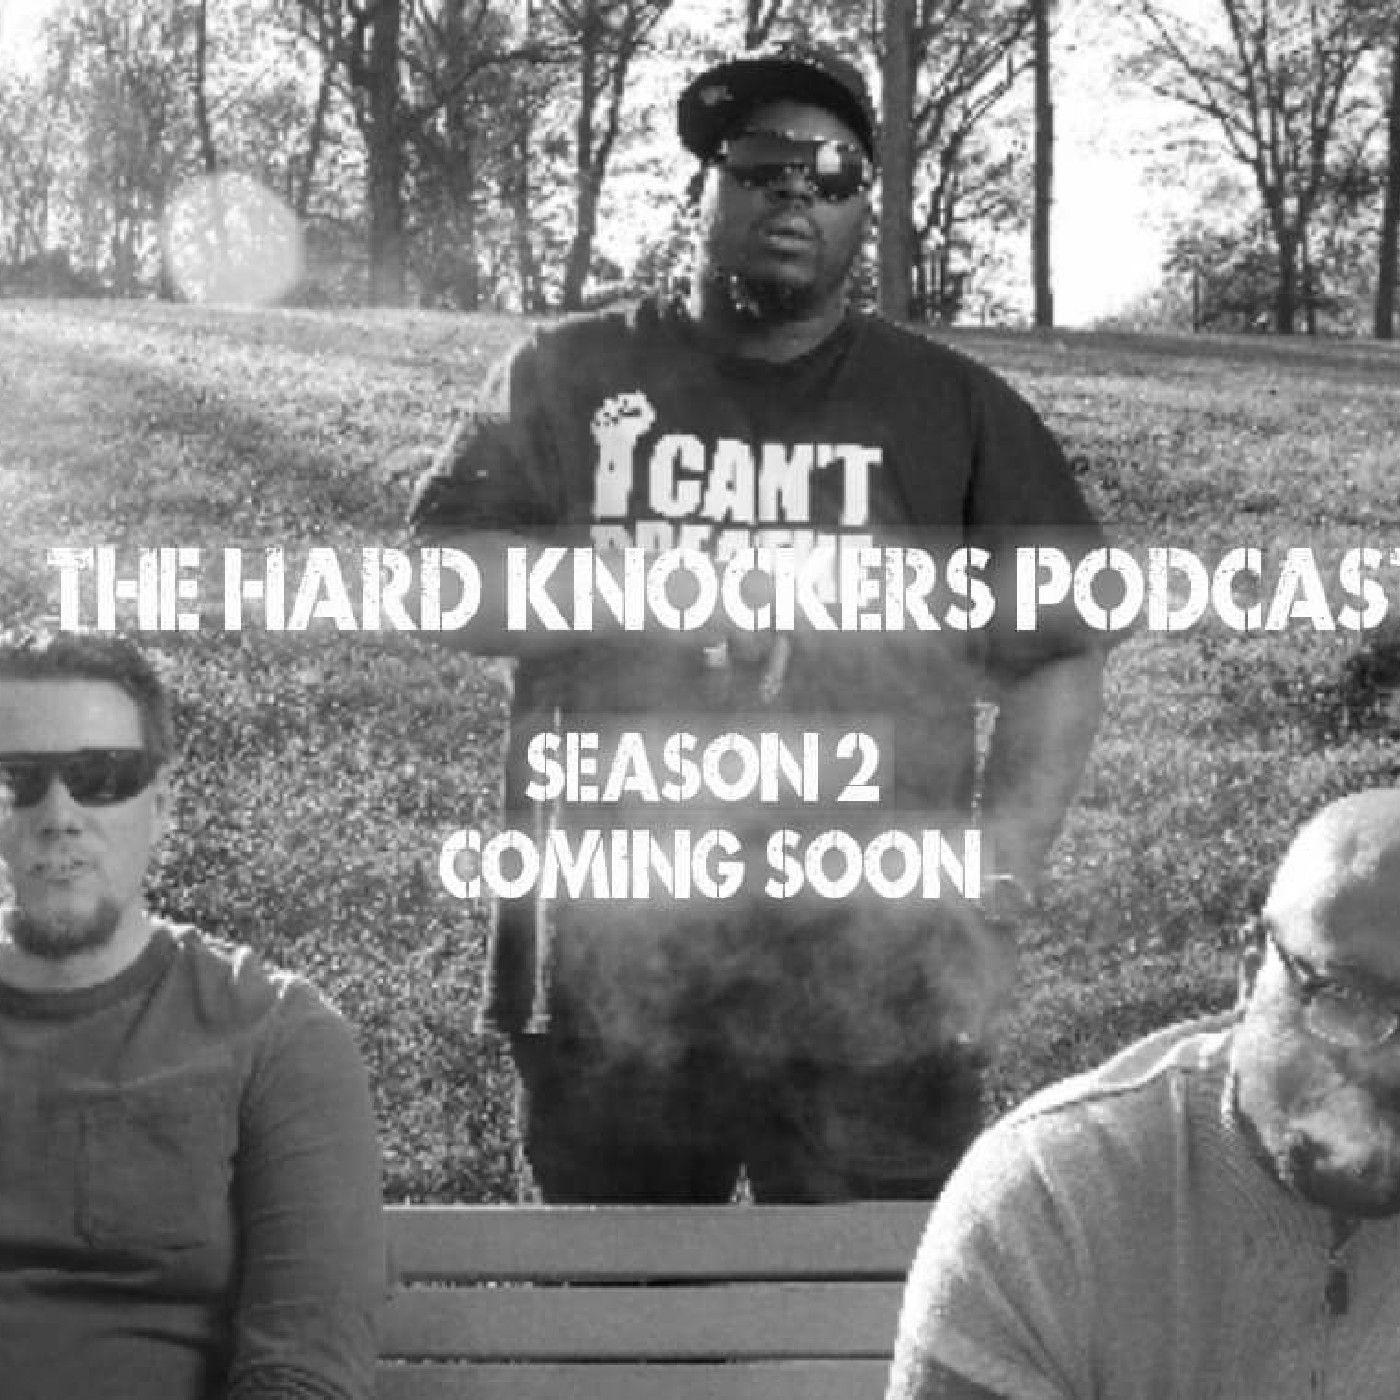 The Hard Knockers Podcast